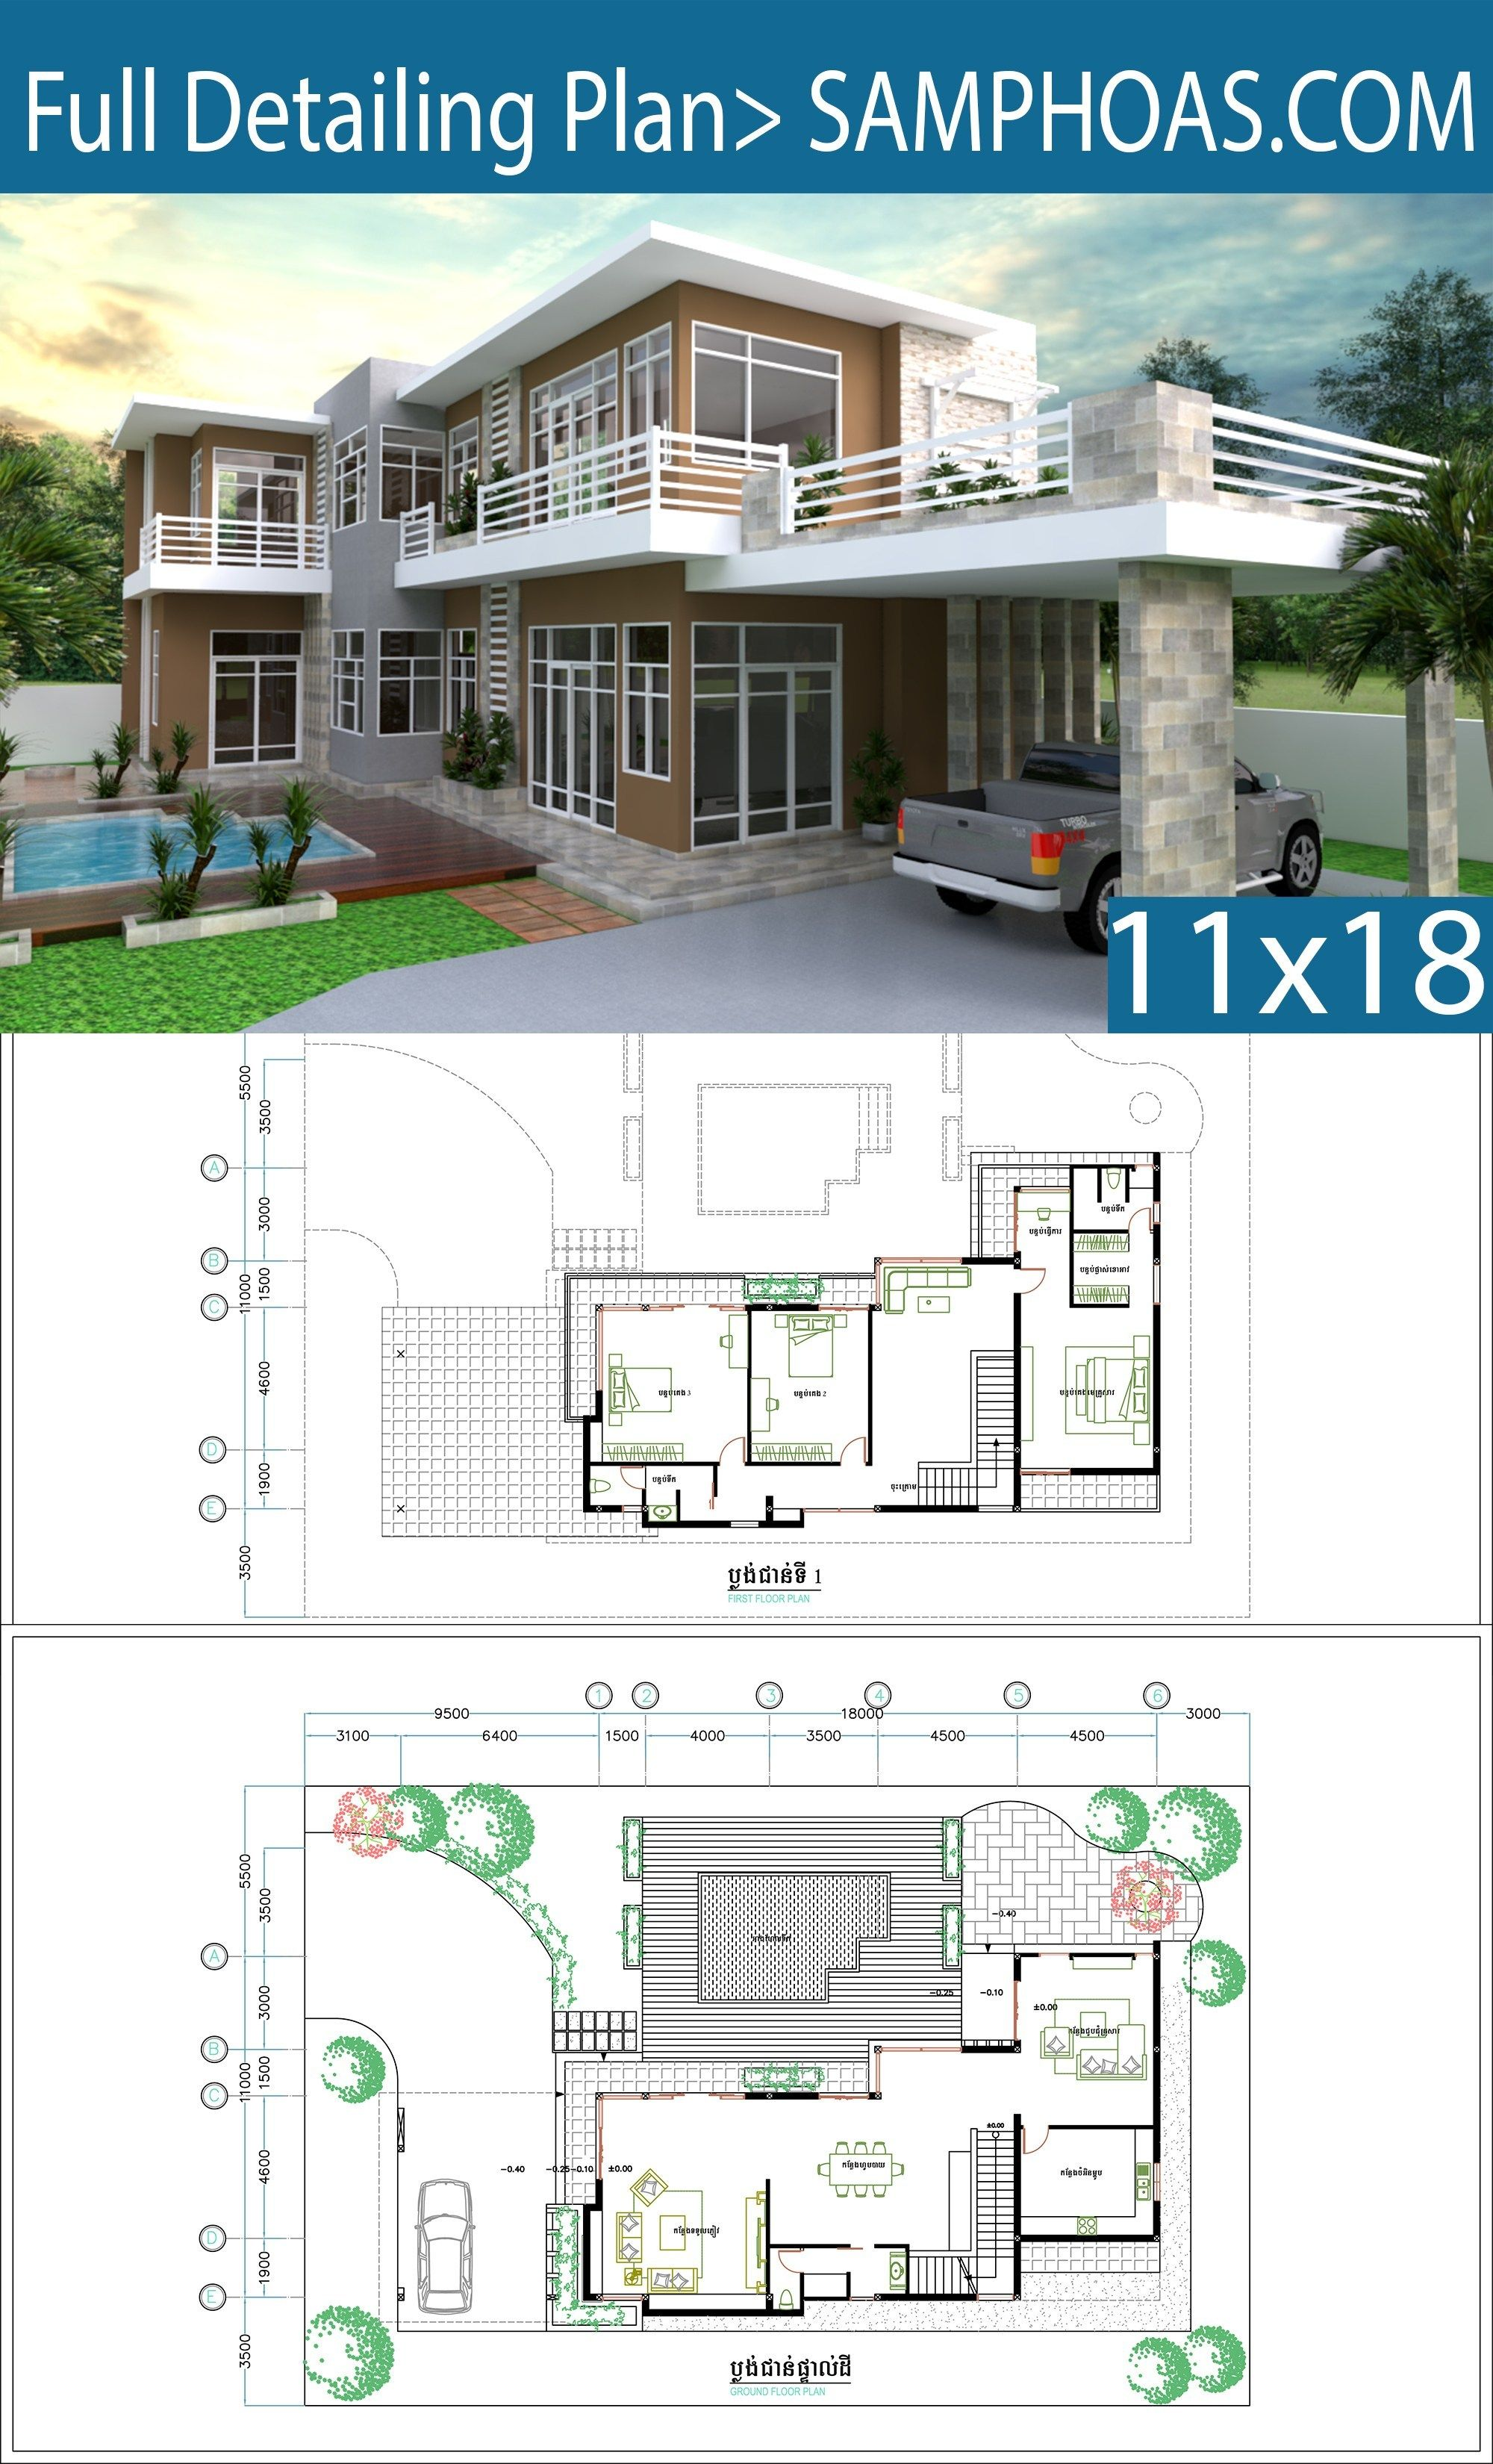 3 Bedrooms Villa Design Plan 11x18m Samphoas Plan Villa Design Residential Architecture Plan Home Design Floor Plans